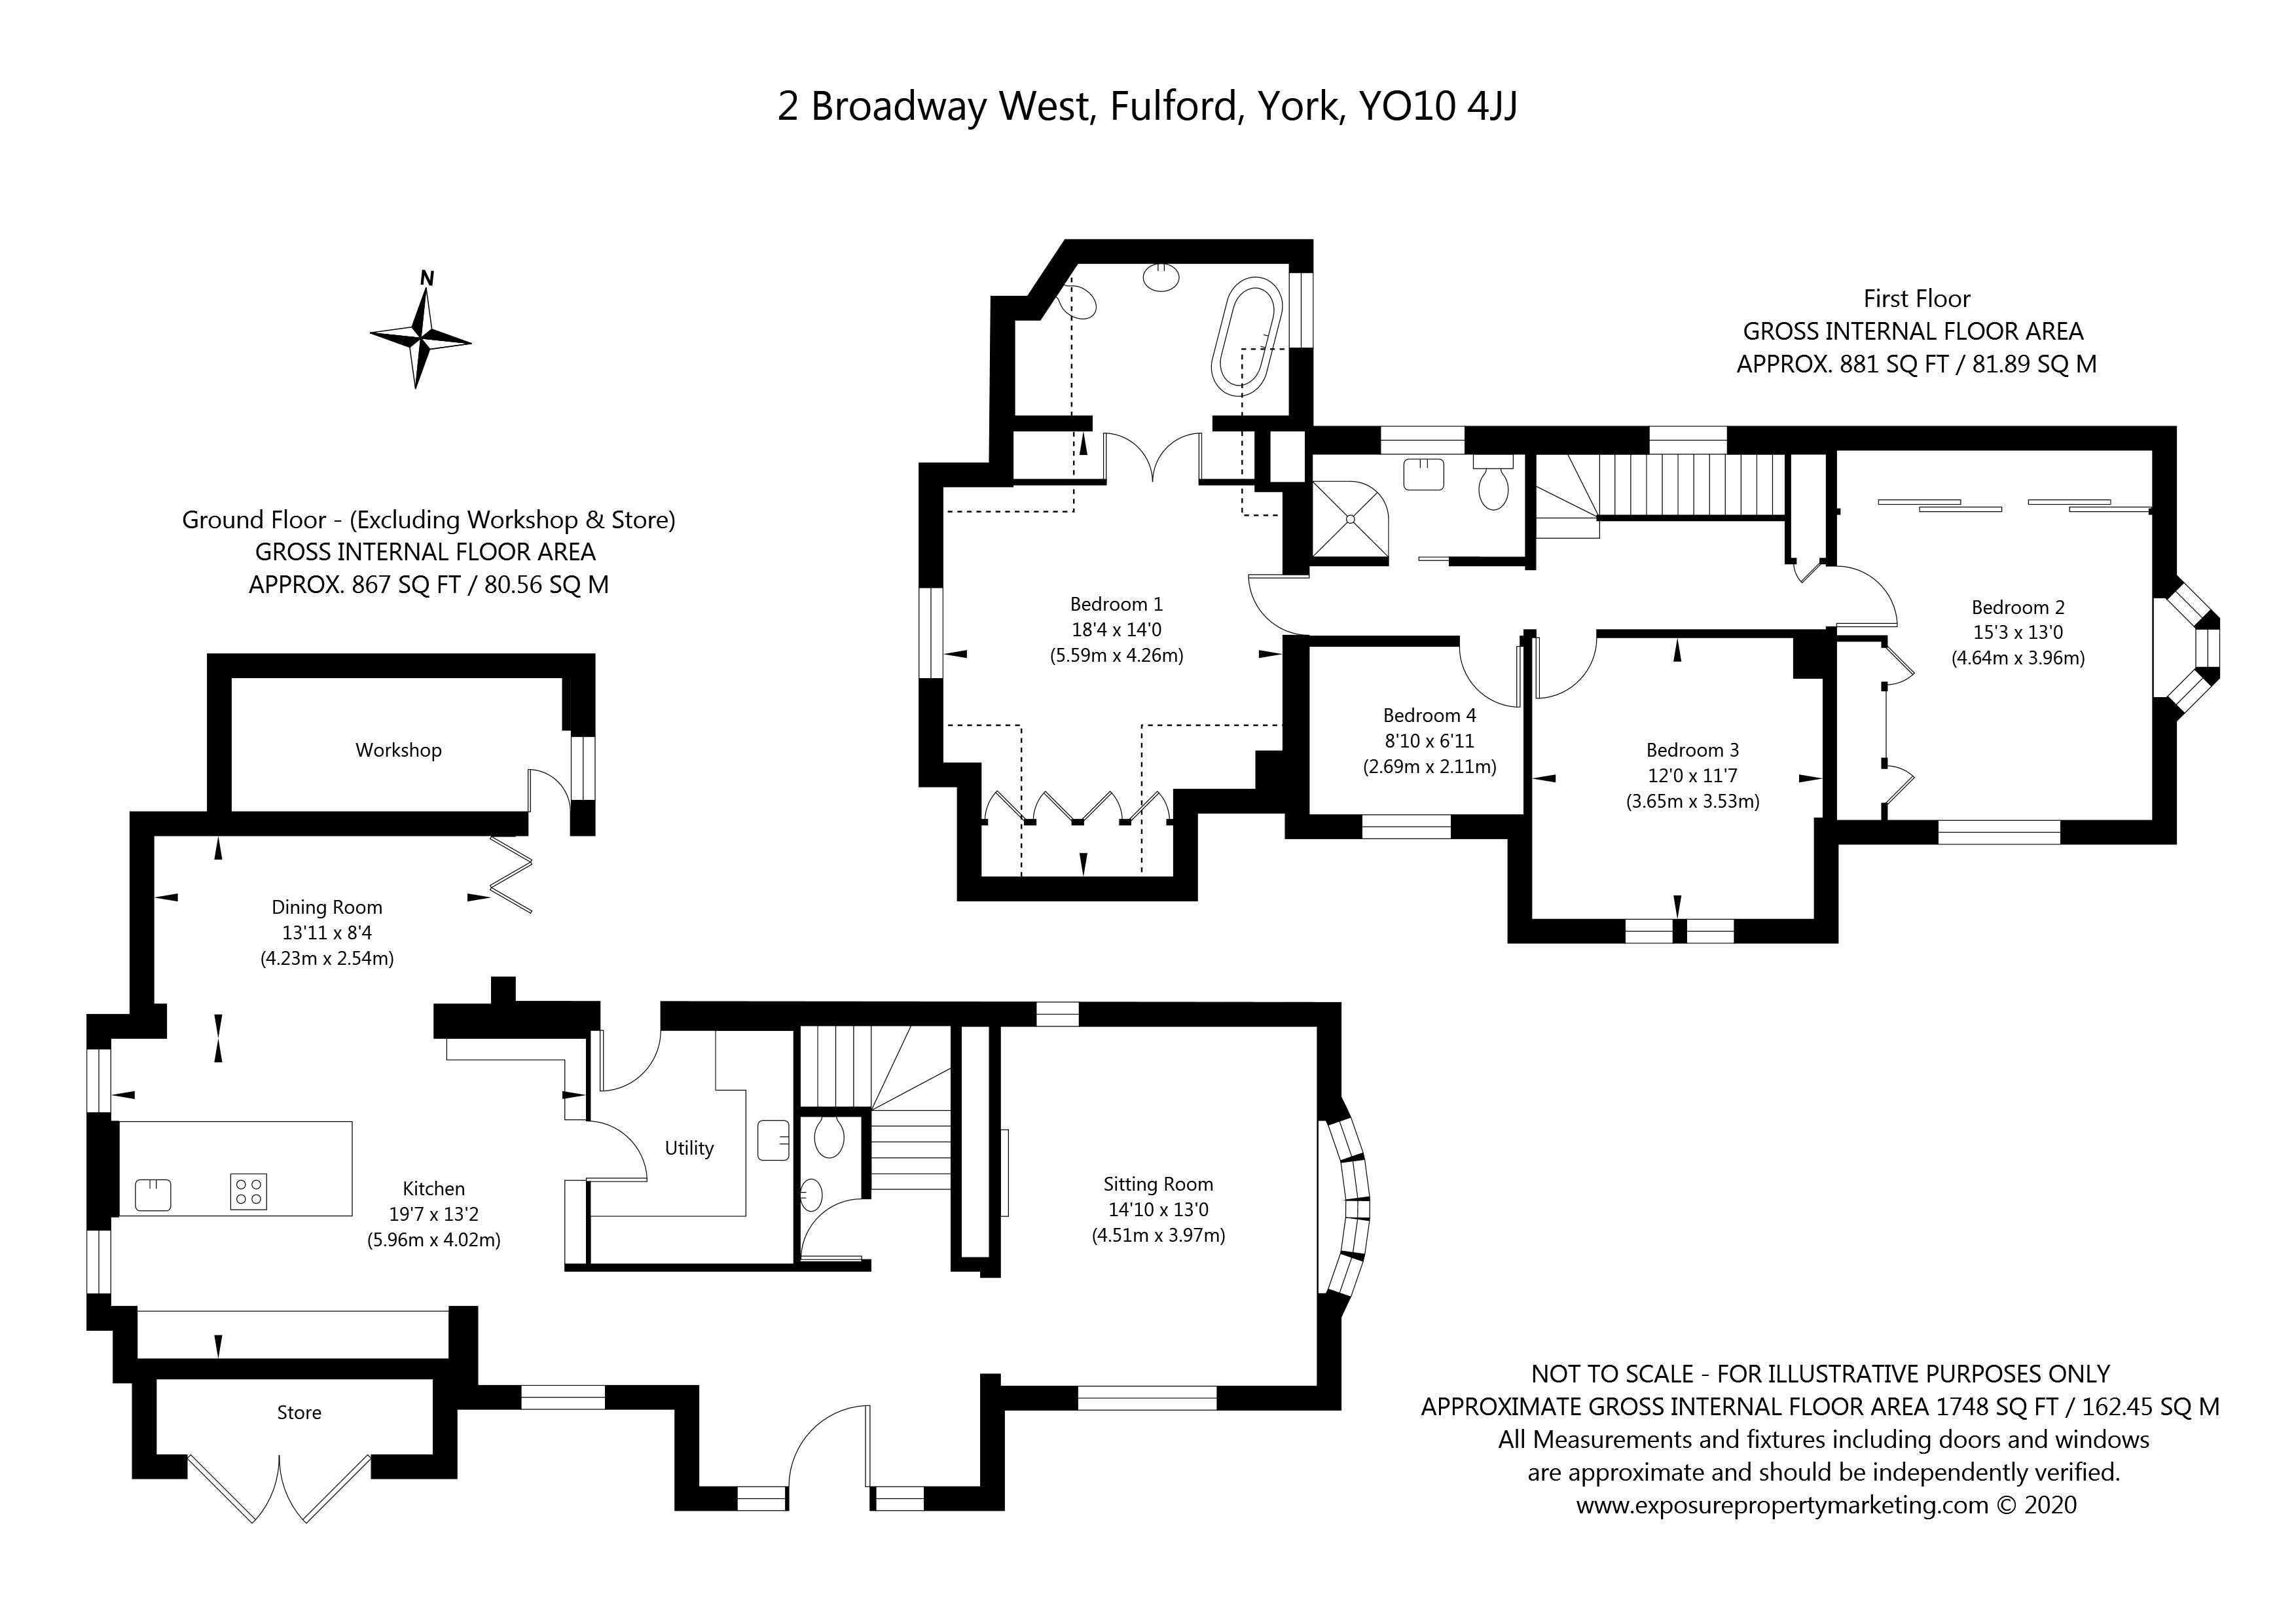 Broadway West, Fulford, York property floorplan